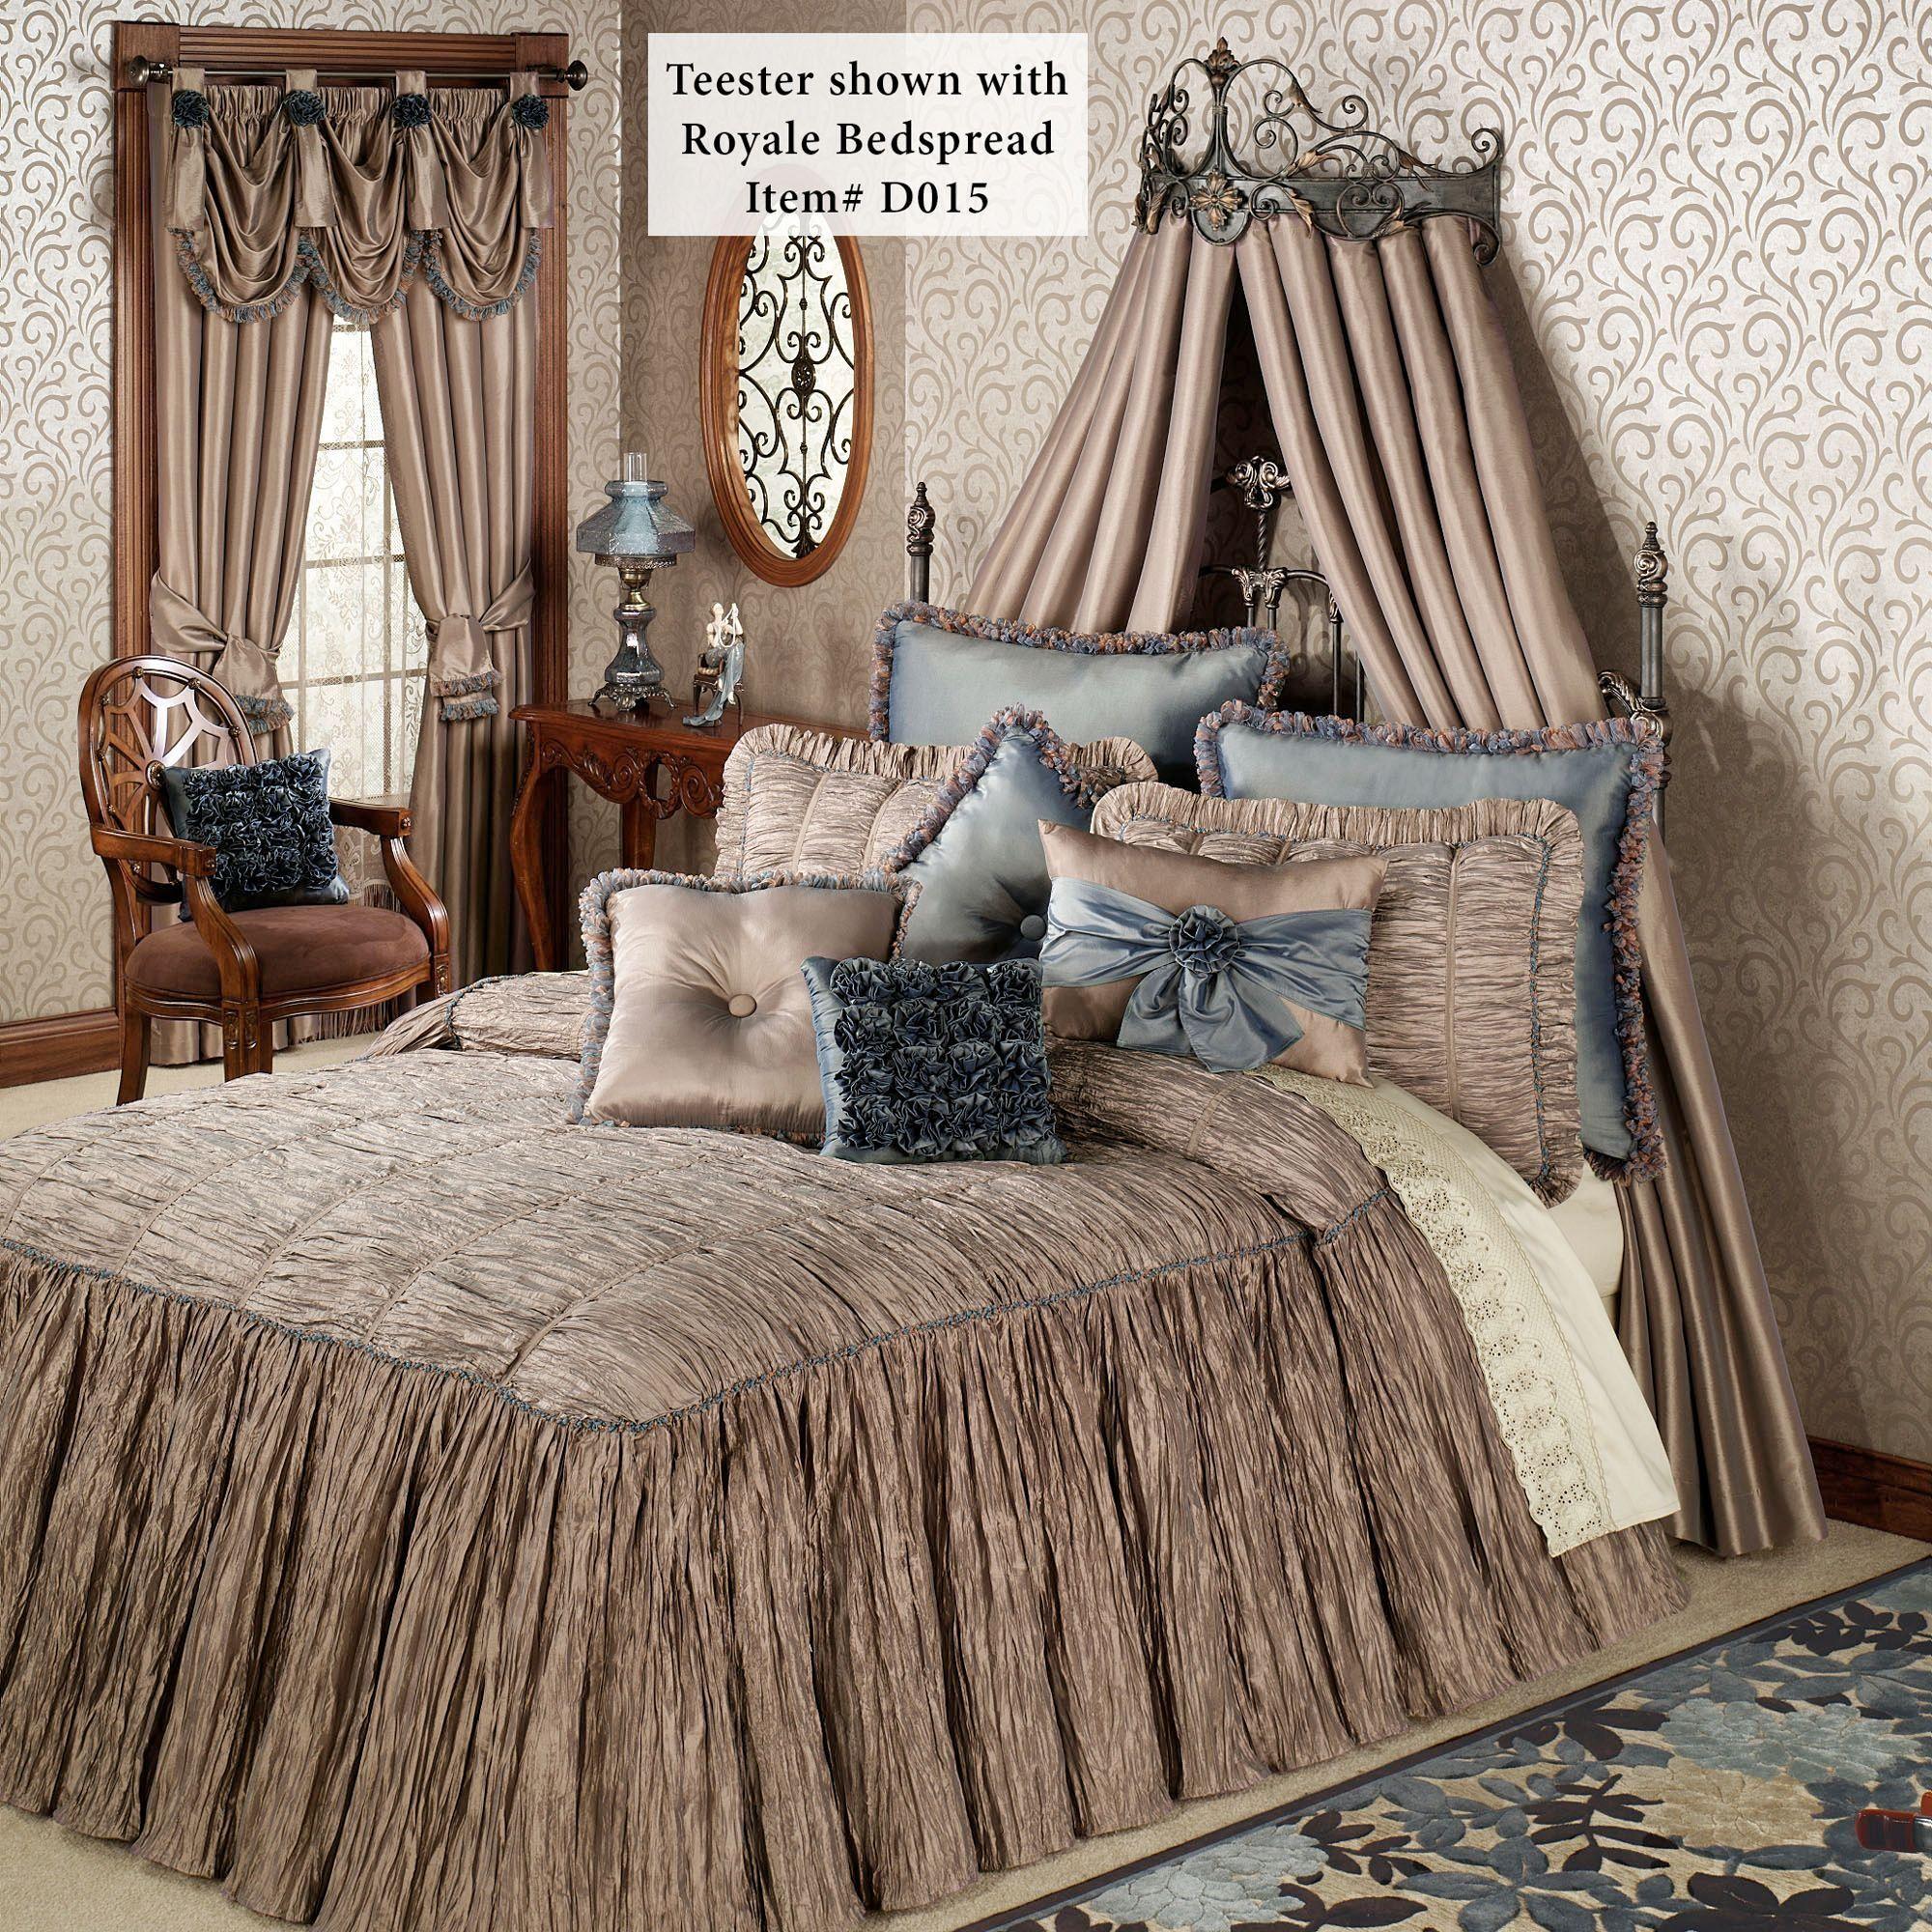 Teagan Wall Teester Bed Crown on Wall Teester Bed Crown  id=48710